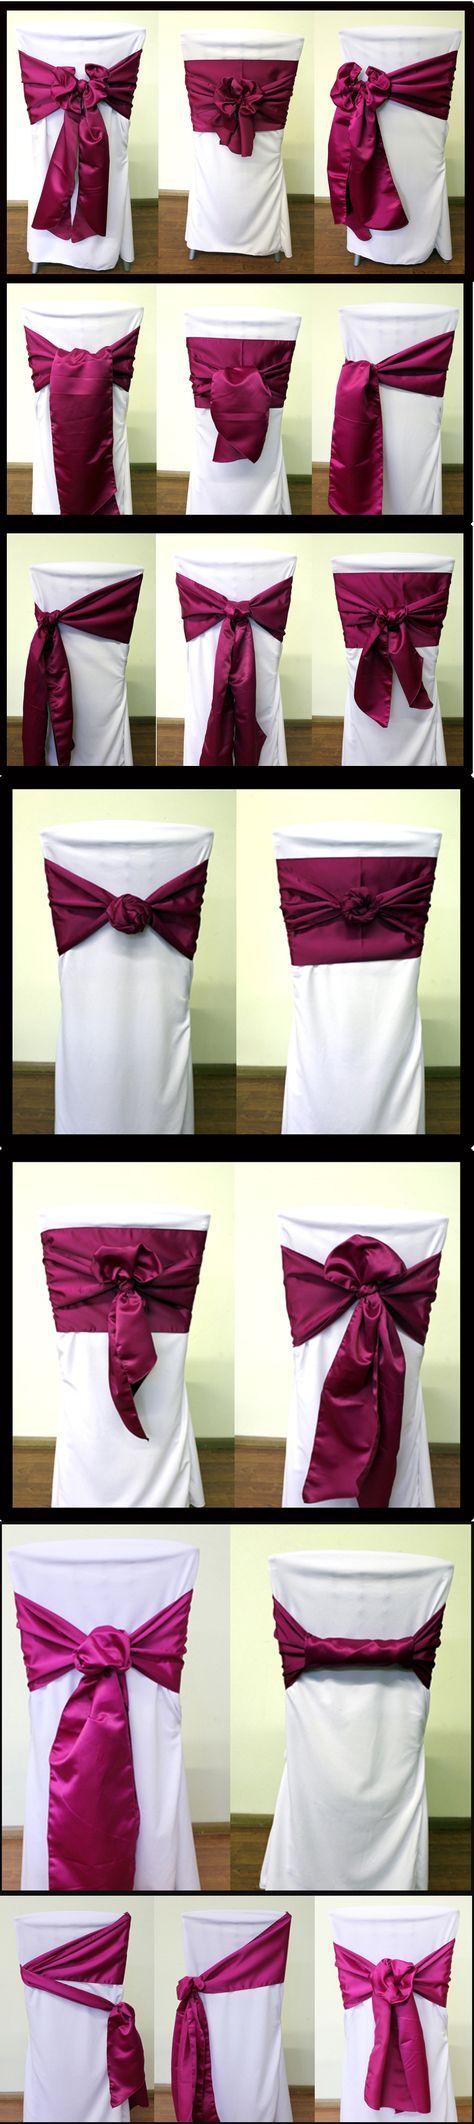 18 ways to tie a chair sash